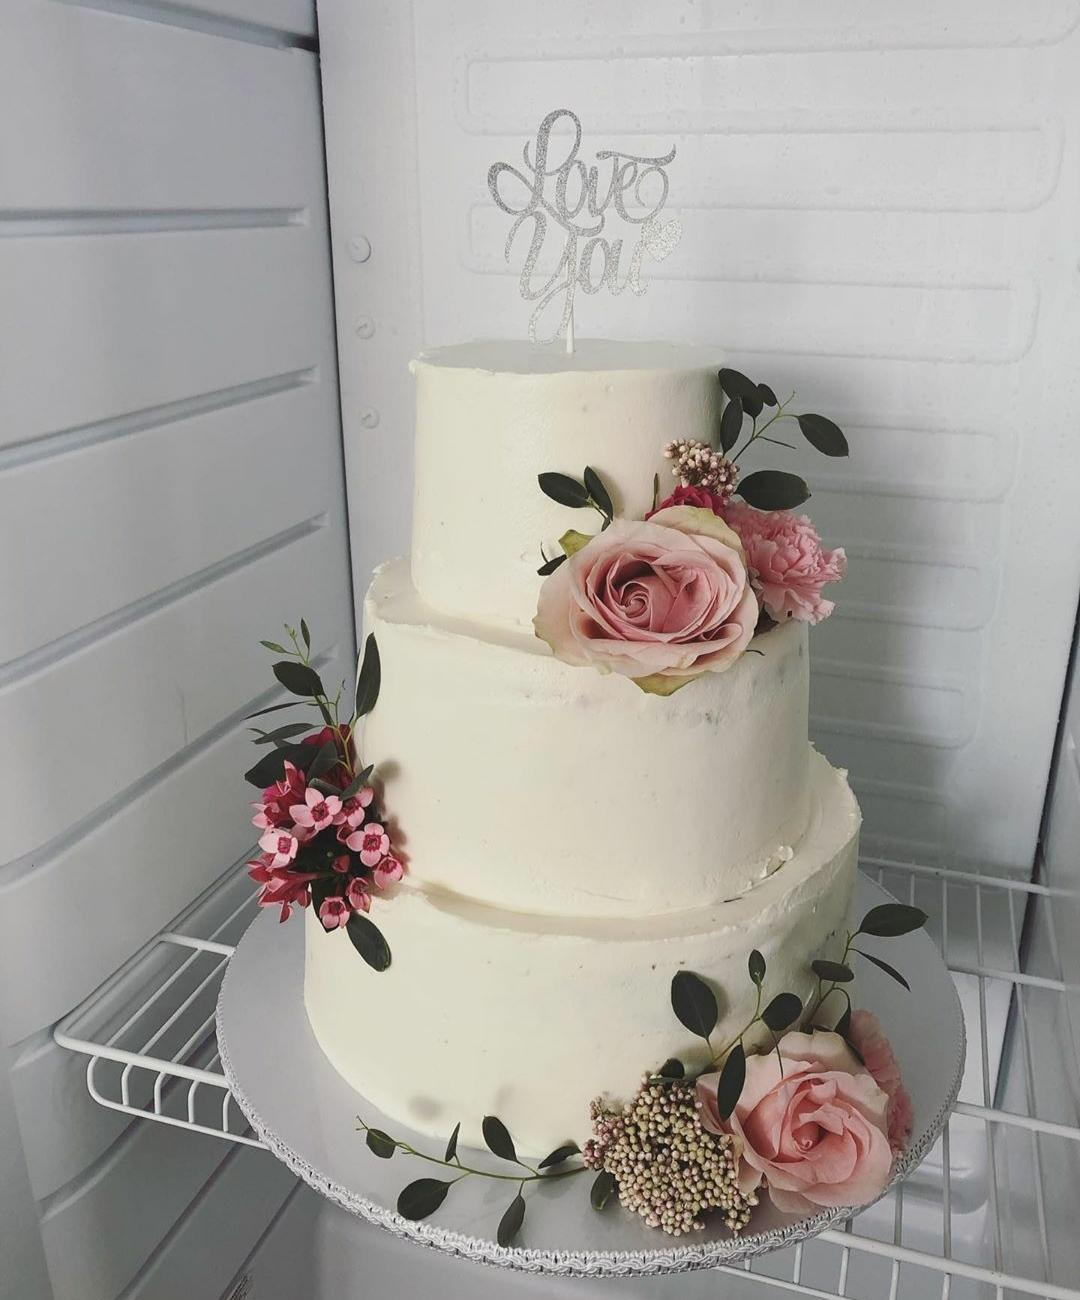 🌺Naša svadbička🌺 - Takúto tortu budeme mať od Masha's Cakes&Sweets 🍰🌺